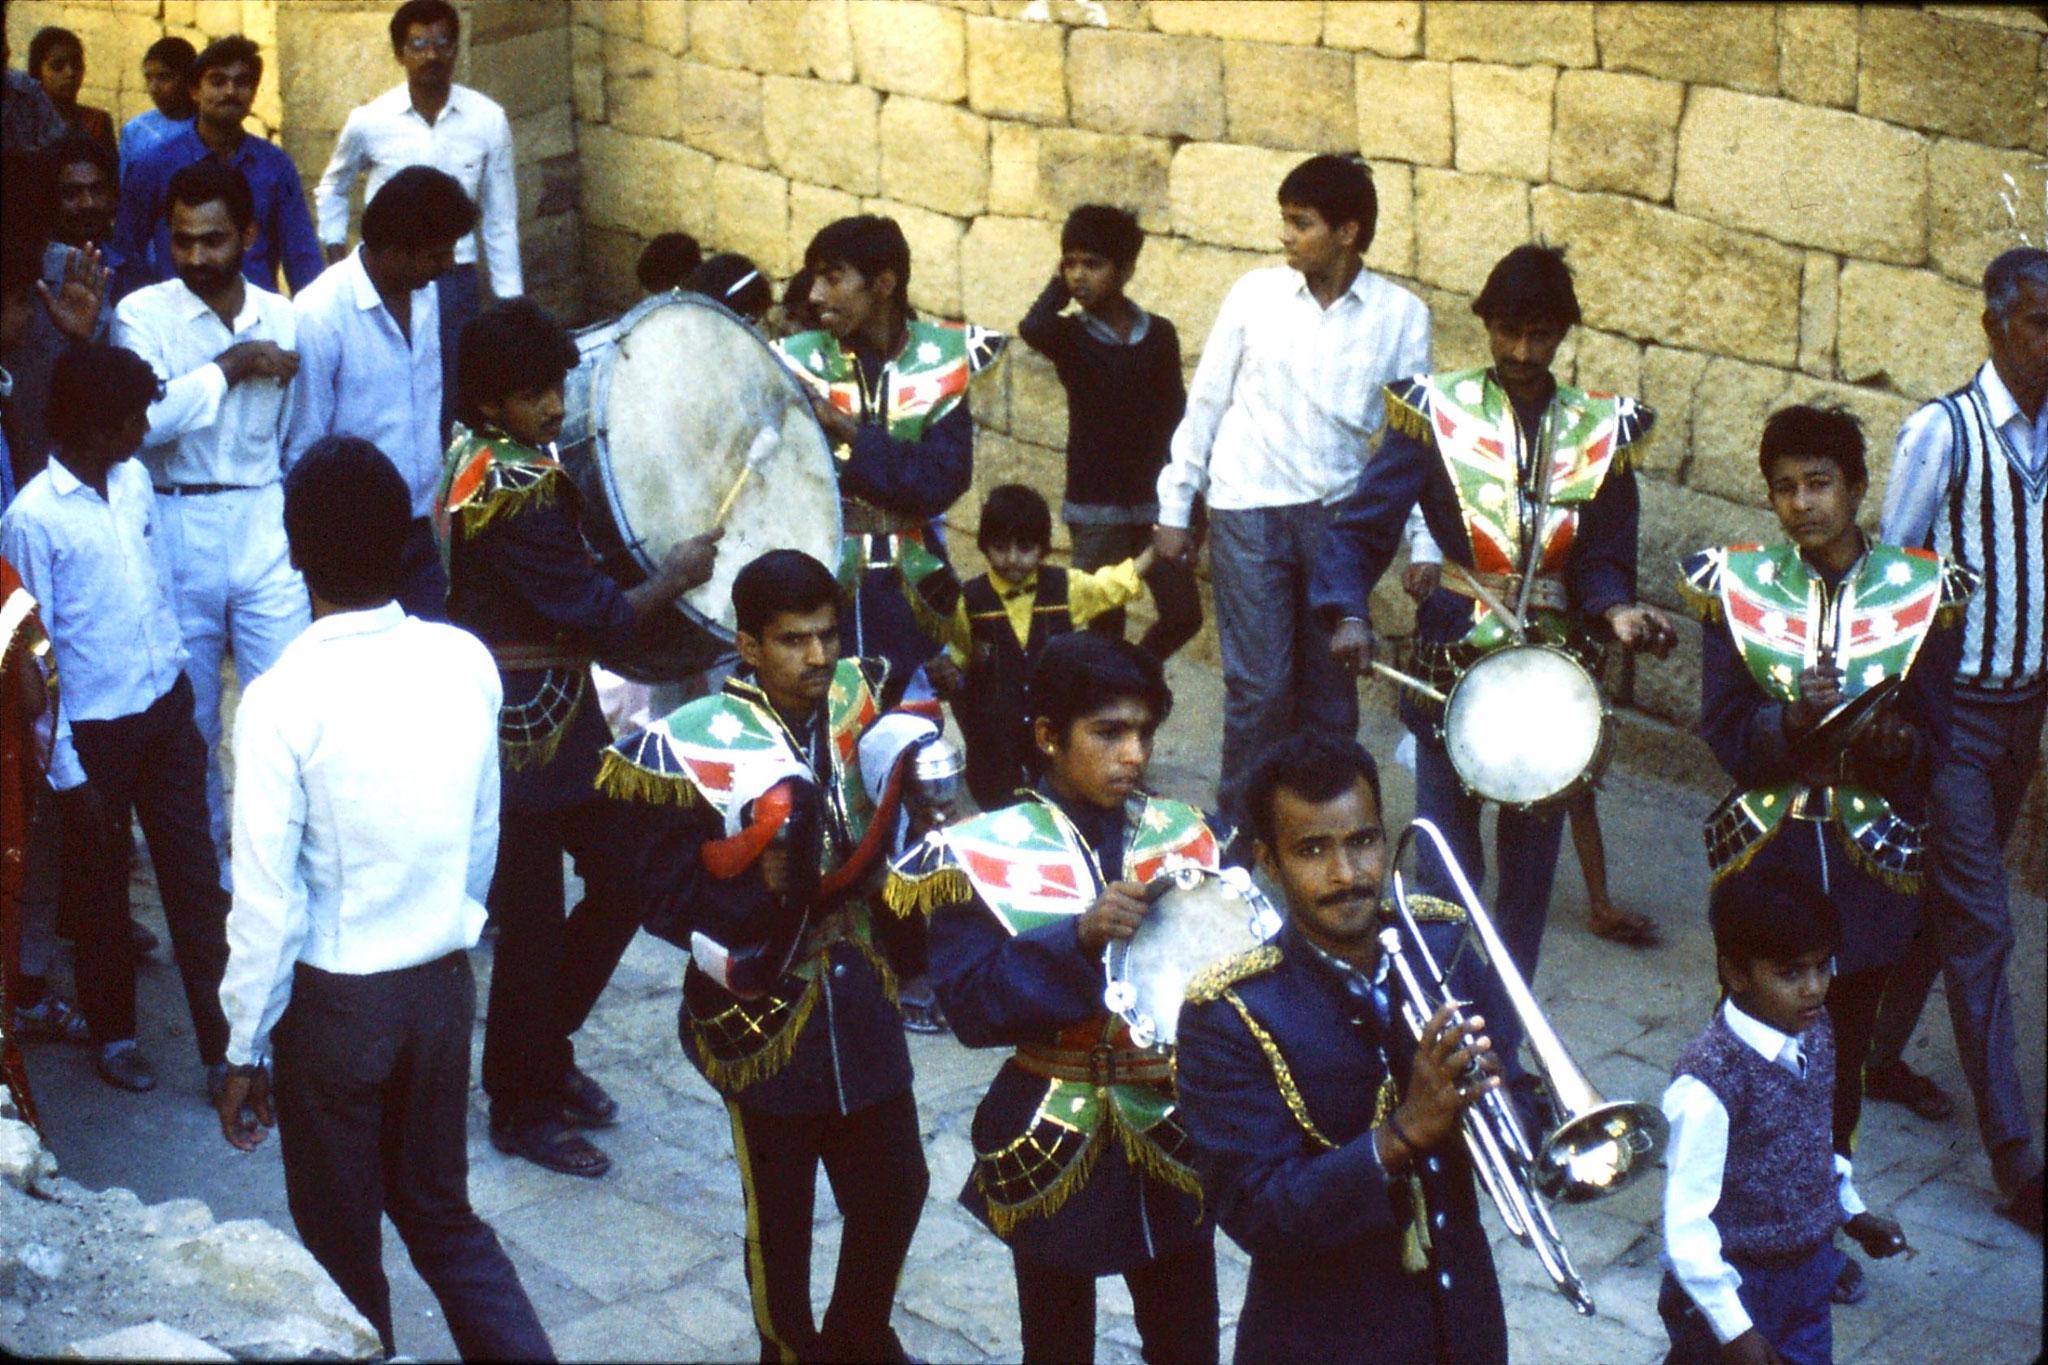 3/12/1989: 2: Jaisalmer wedding procession